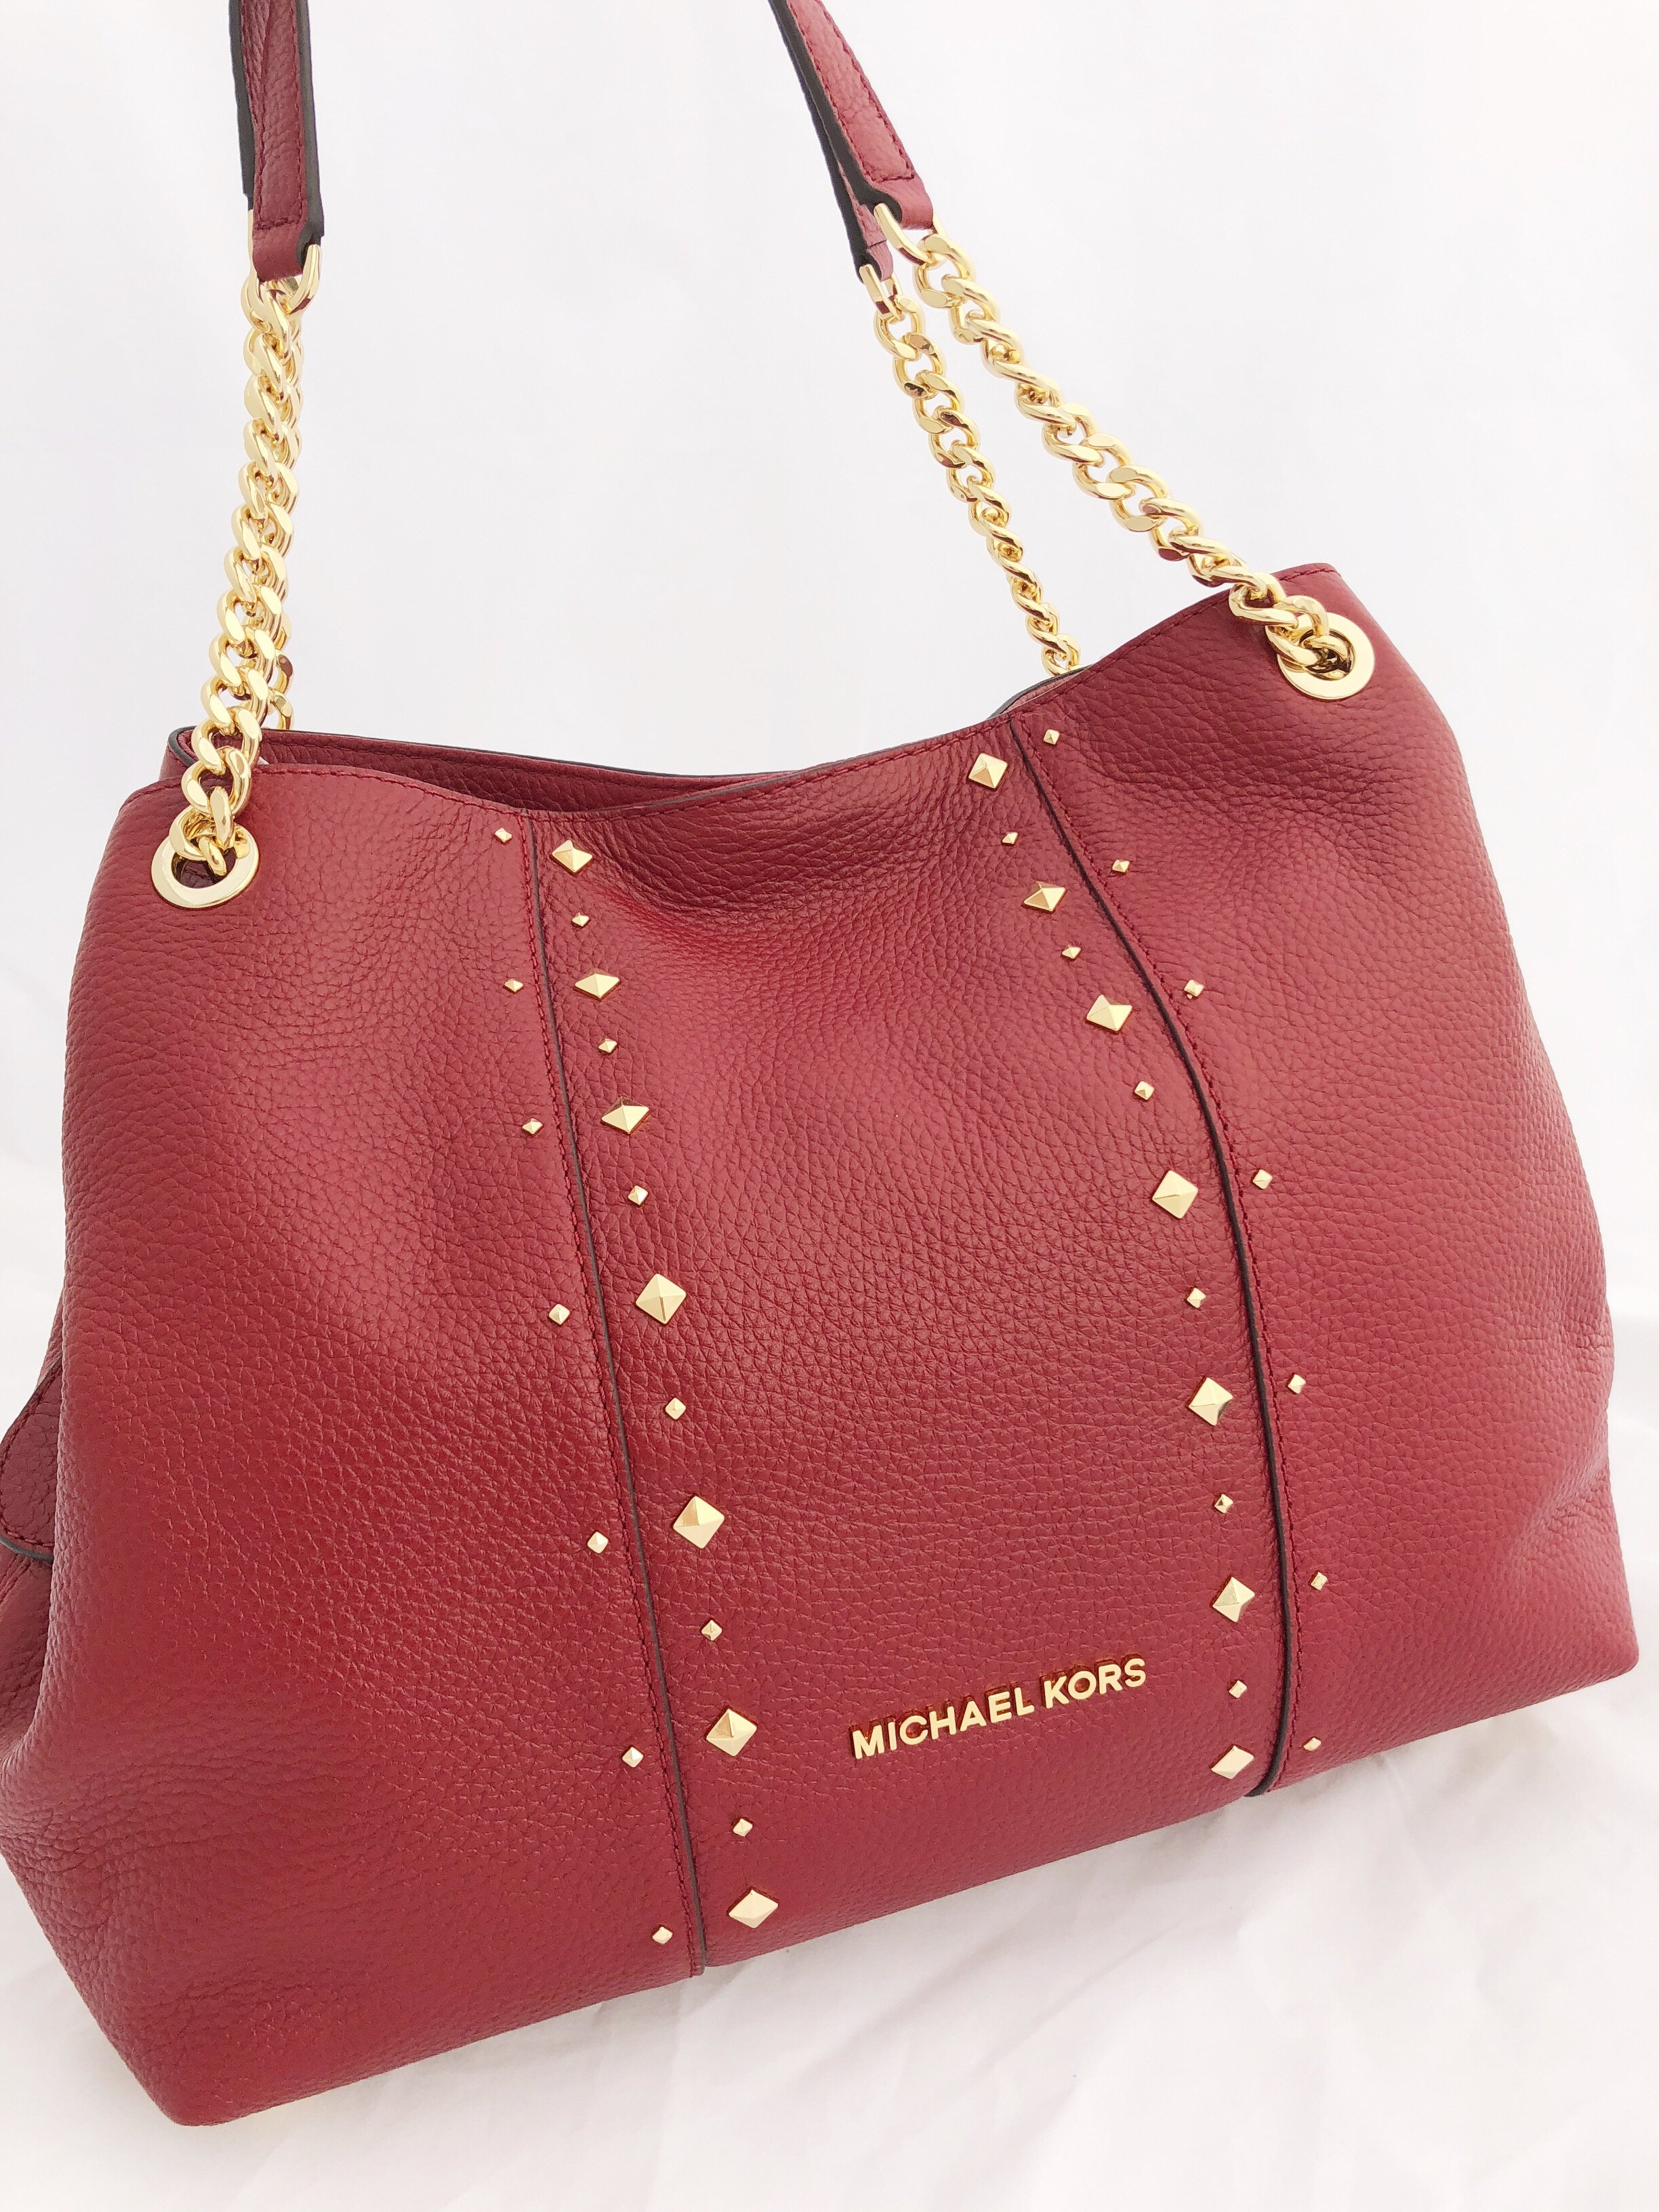 d697b7372204 Michael Kors - Michael Kors Jet Set Large Chain Shoulder Bag Hobo Tote  Leather Cherry Red Stud - Walmart.com